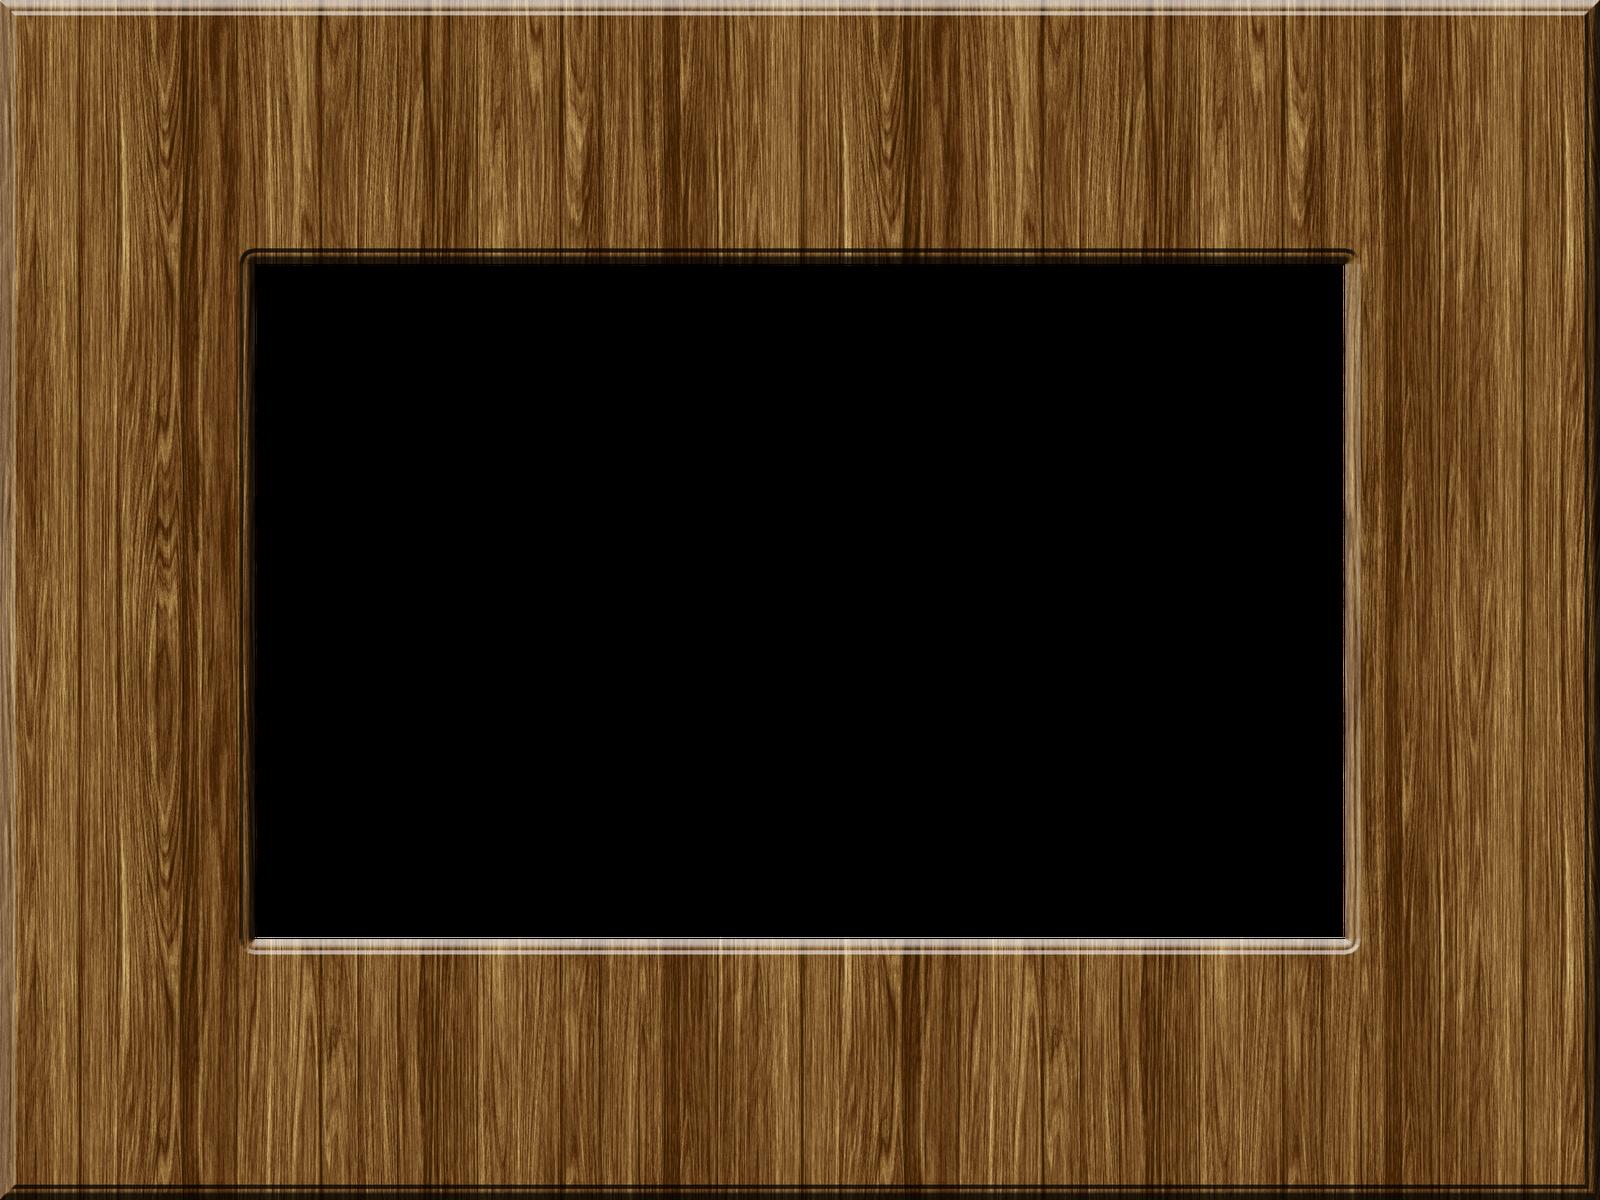 Marcos de madera para fotos imagui - Marcos de fotos madera ...